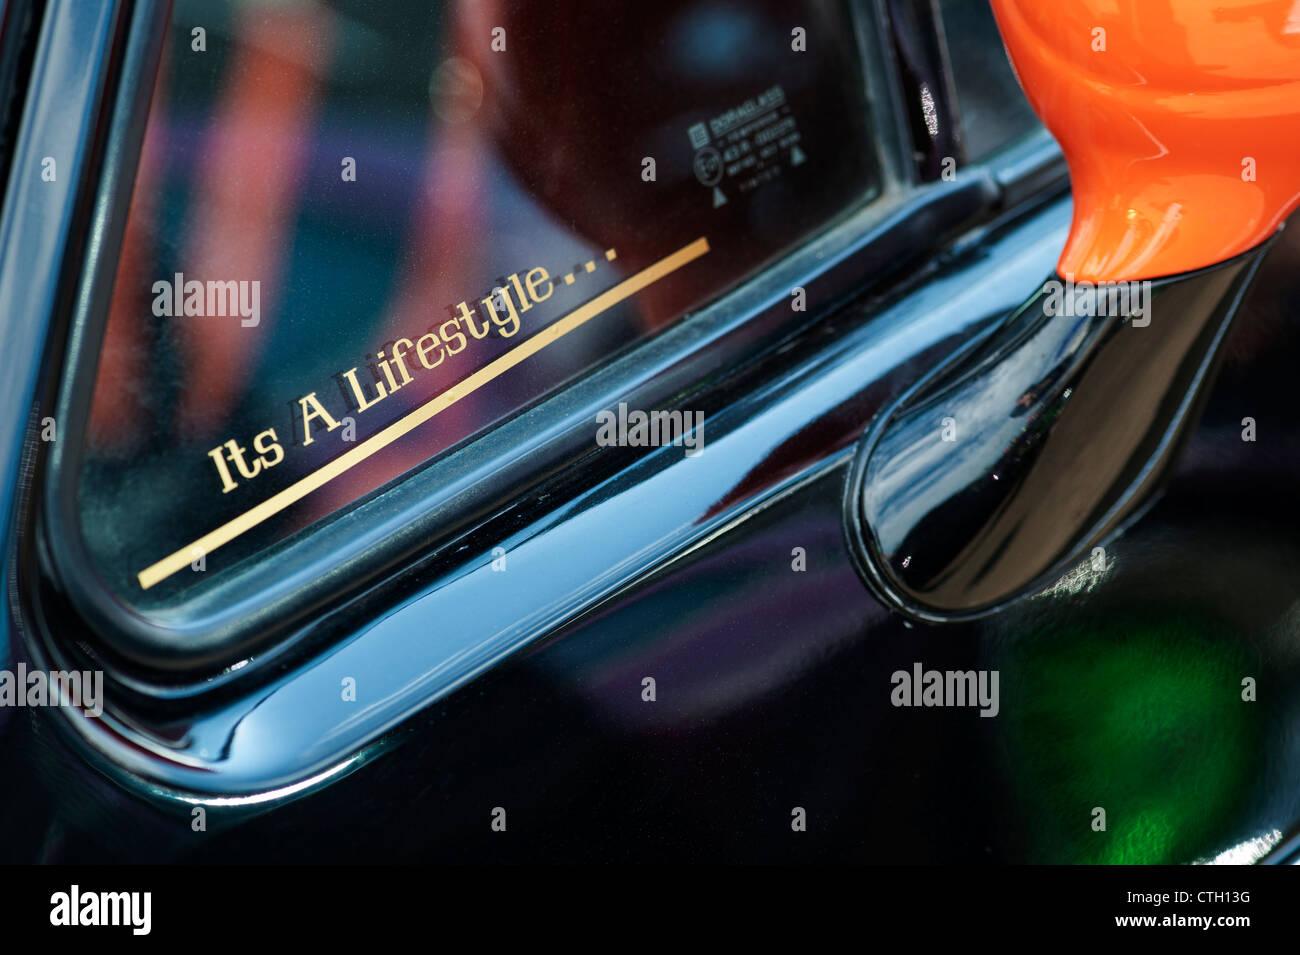 Its a lifestyle window sticker on a vw beetle car